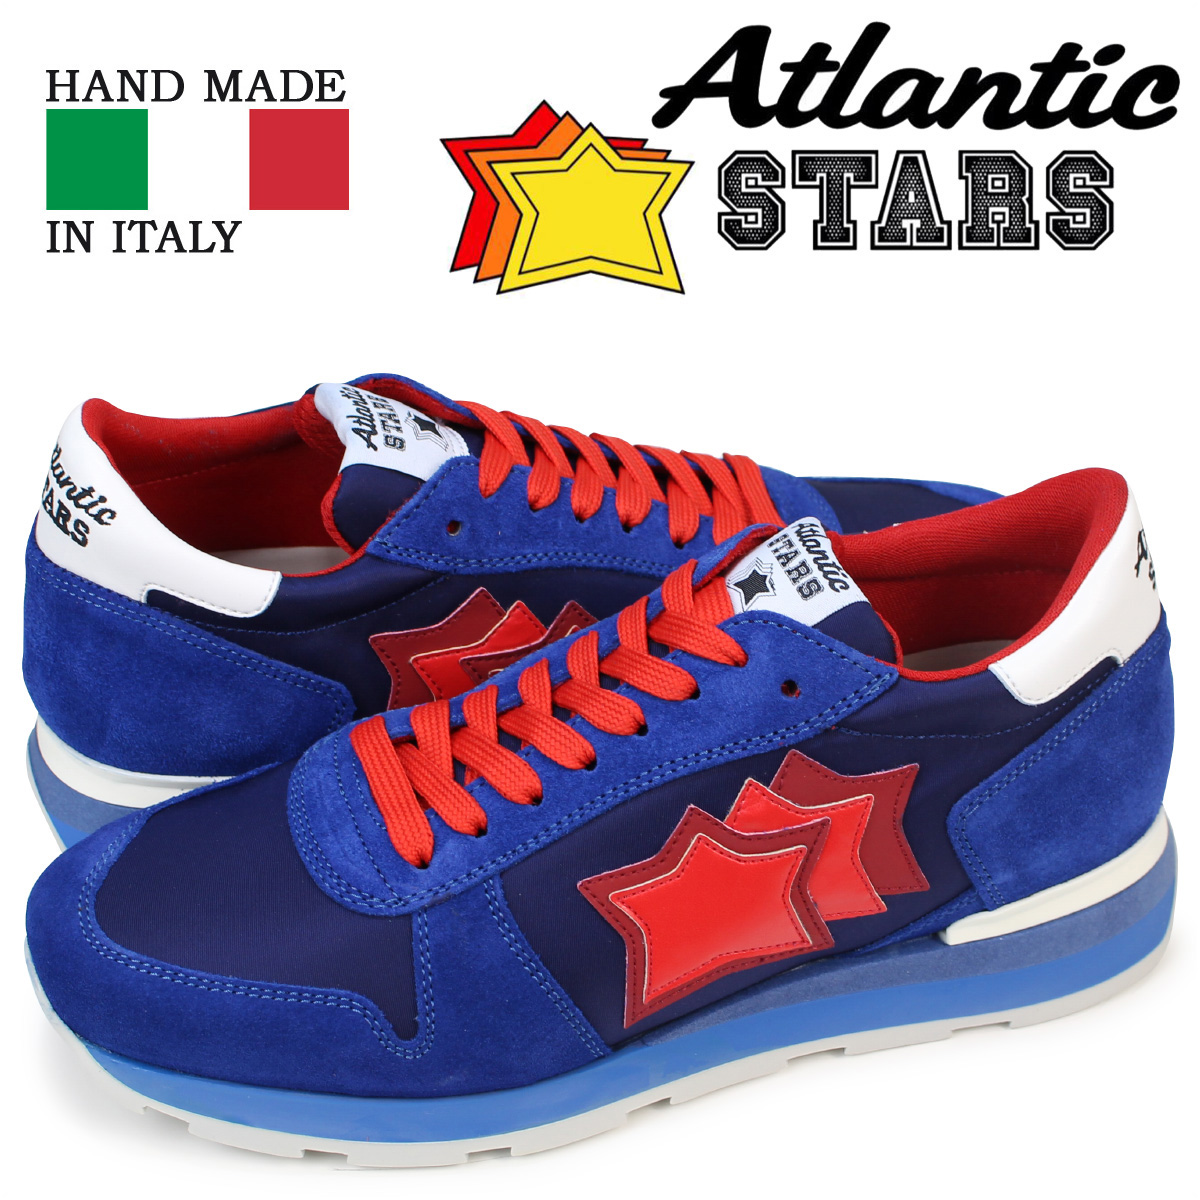 Atlantic STARS SIRIUS アトランティックスターズ メンズ スニーカー ブルー レッド シリウス MN 83B 靴